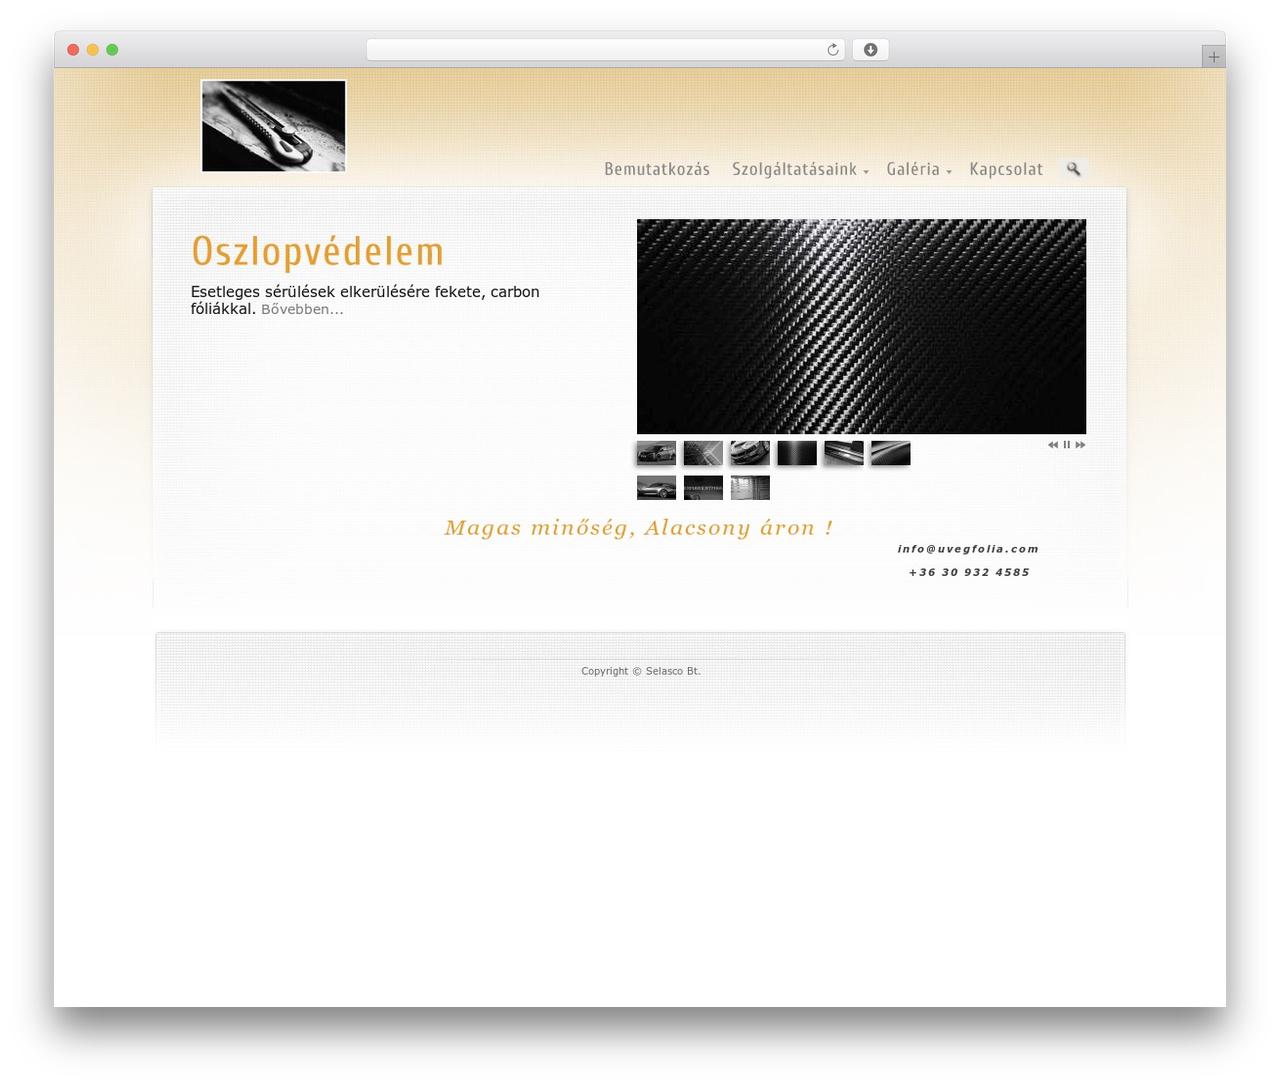 Best WordPress template Prestige Ultimate Wordpress Theme - uvegfolia.com